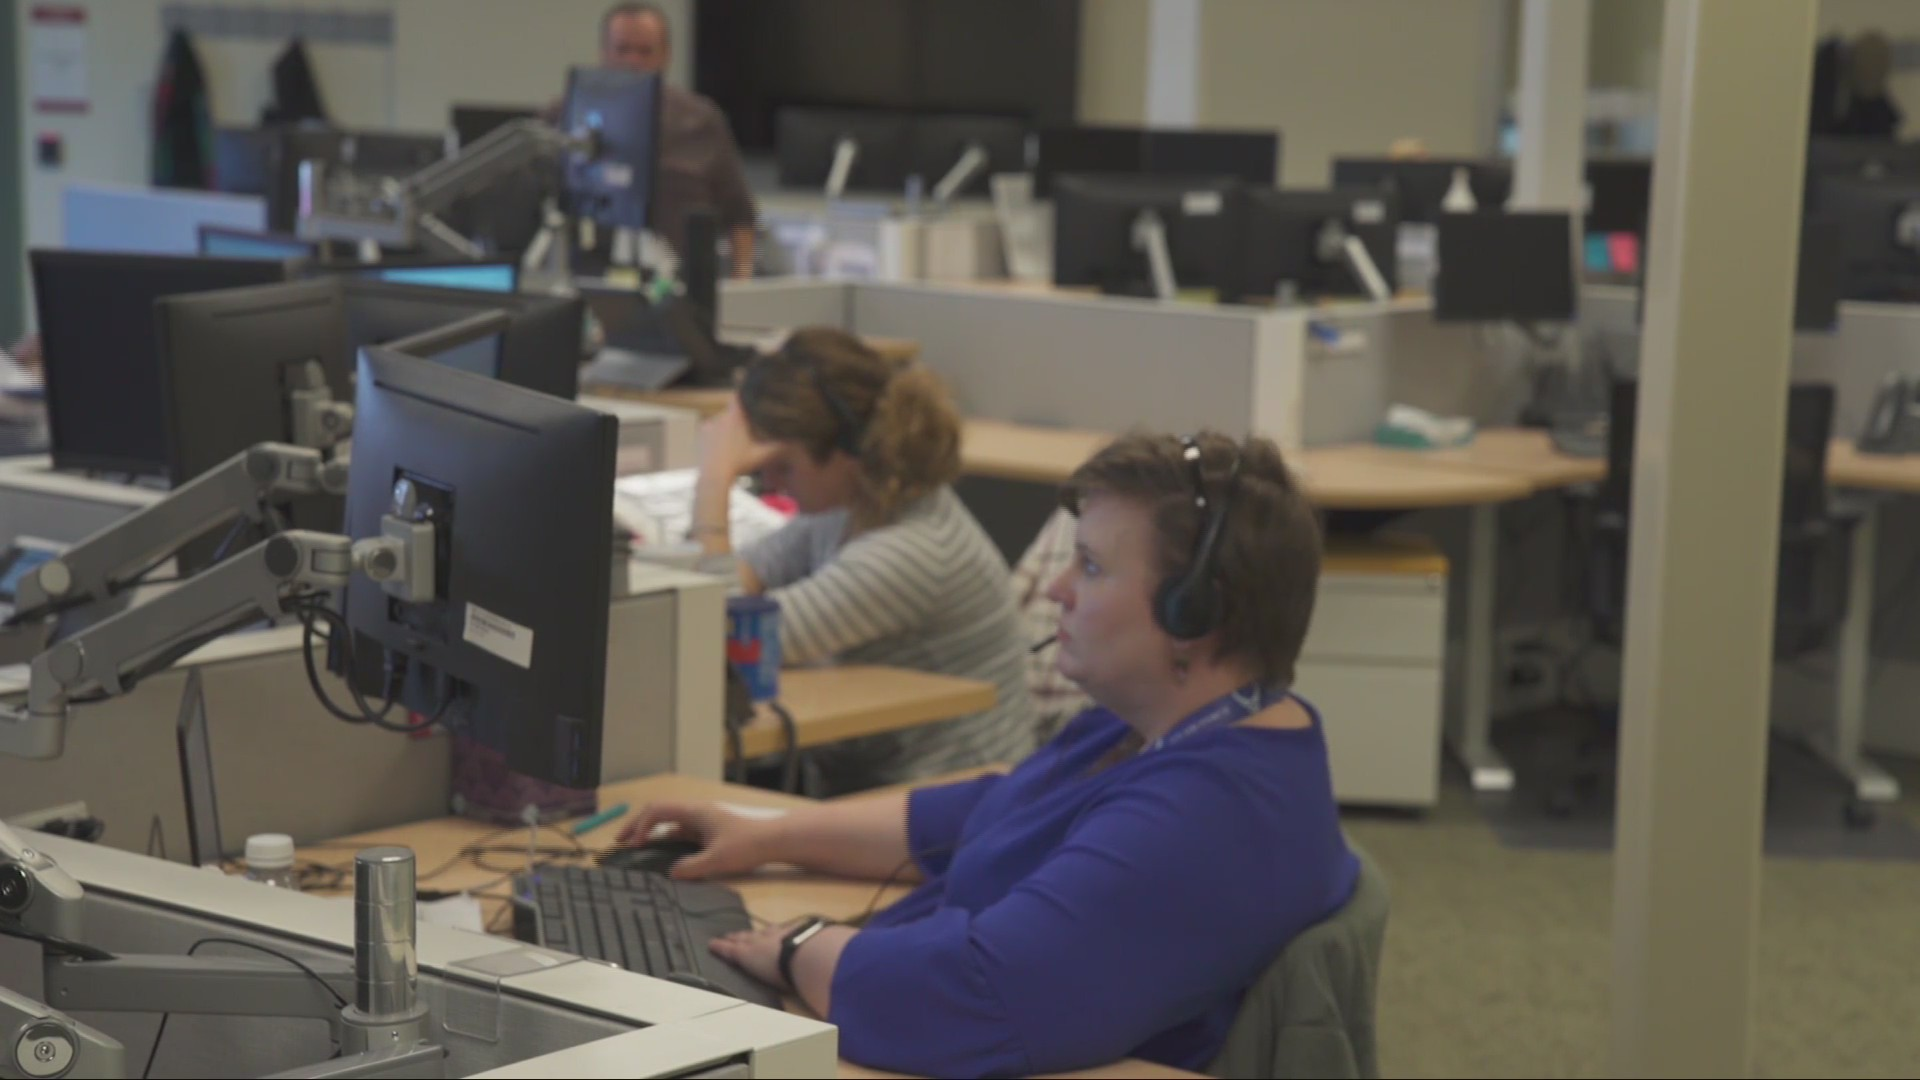 White House Hotline Helps Veterans in Need